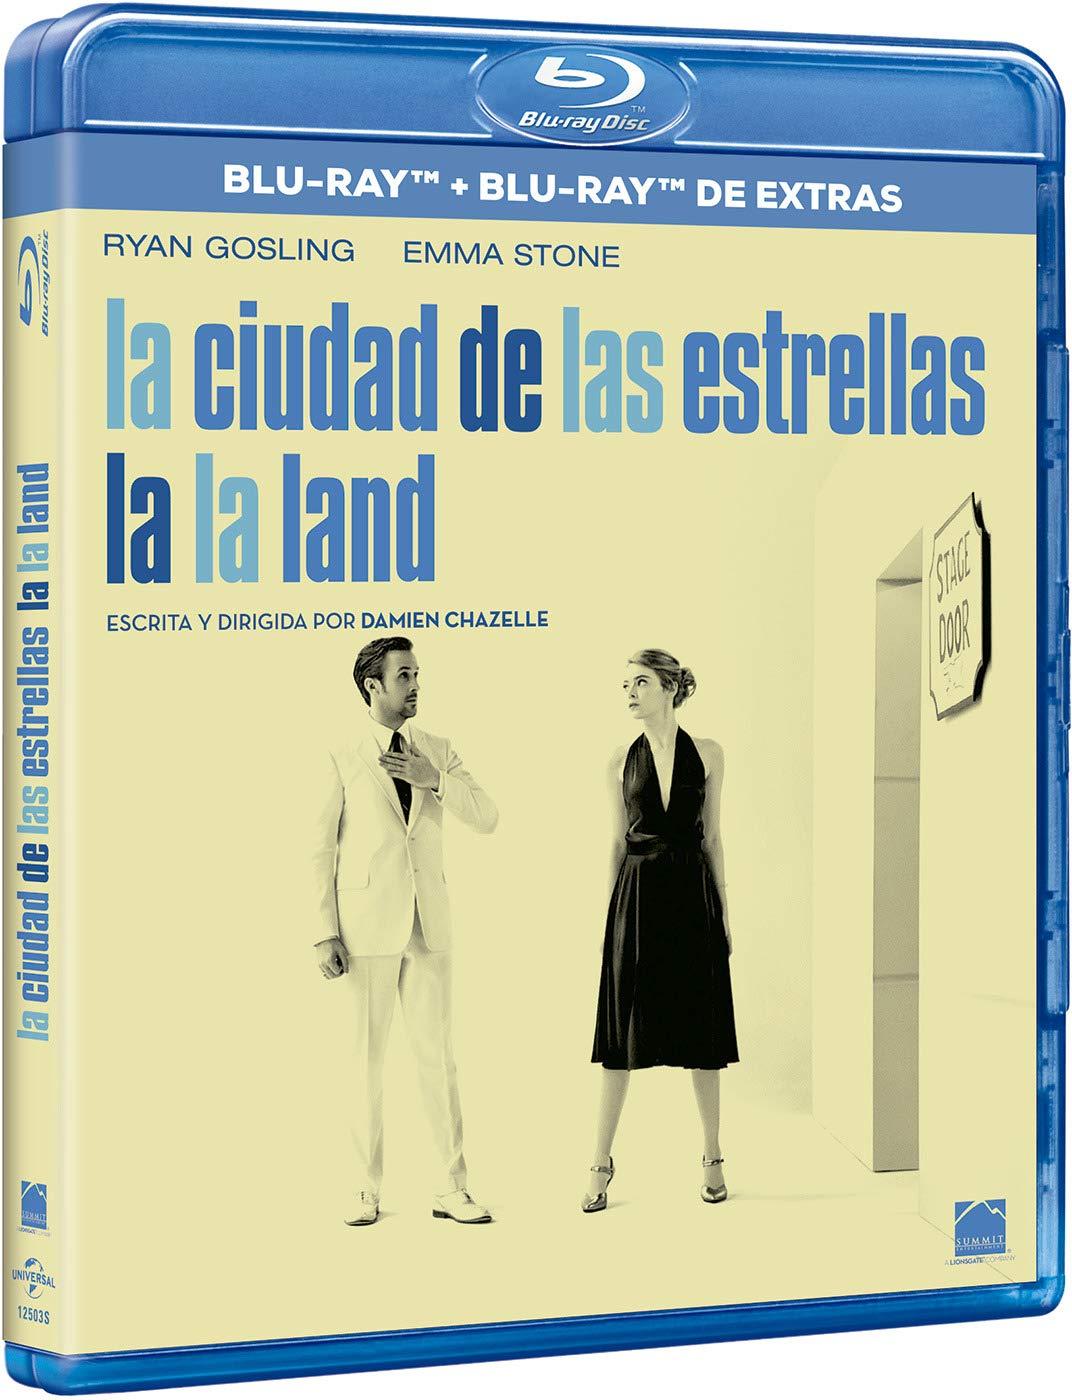 La la land (BD + BD Extras) [Blu-ray]